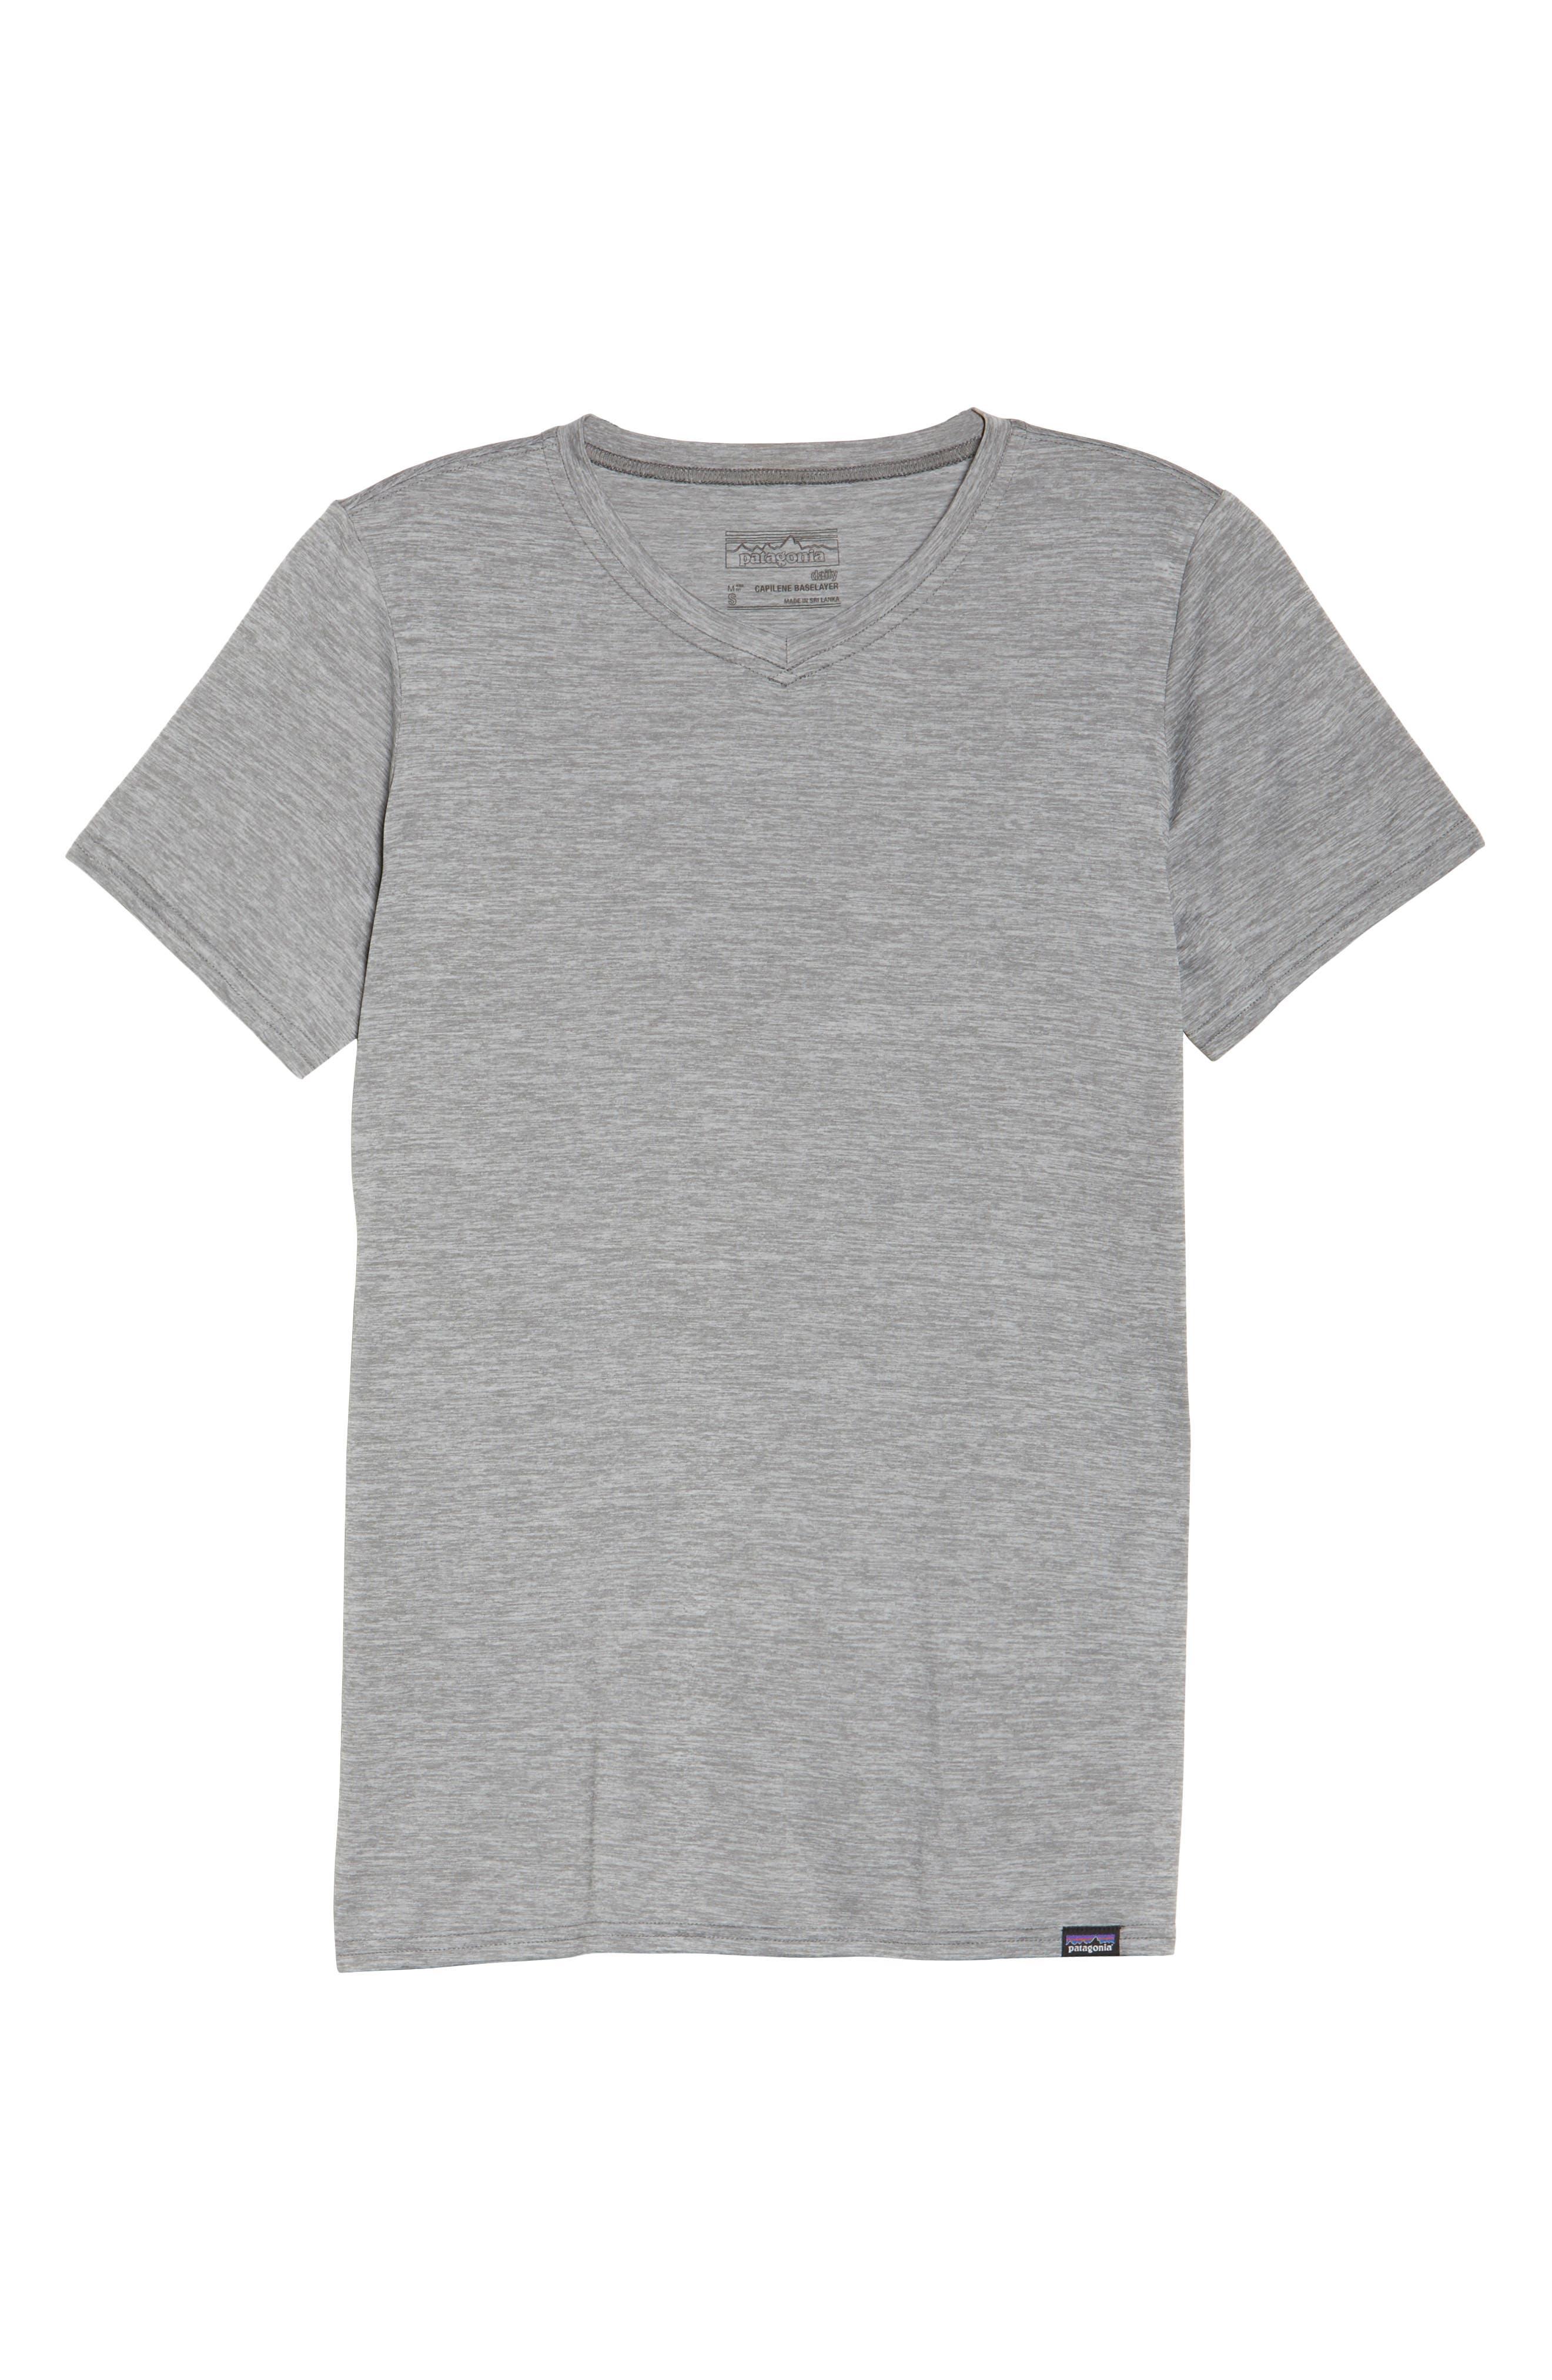 Capilene<sup>®</sup> Dailty T-Shirt,                             Alternate thumbnail 7, color,                             Feather Grey